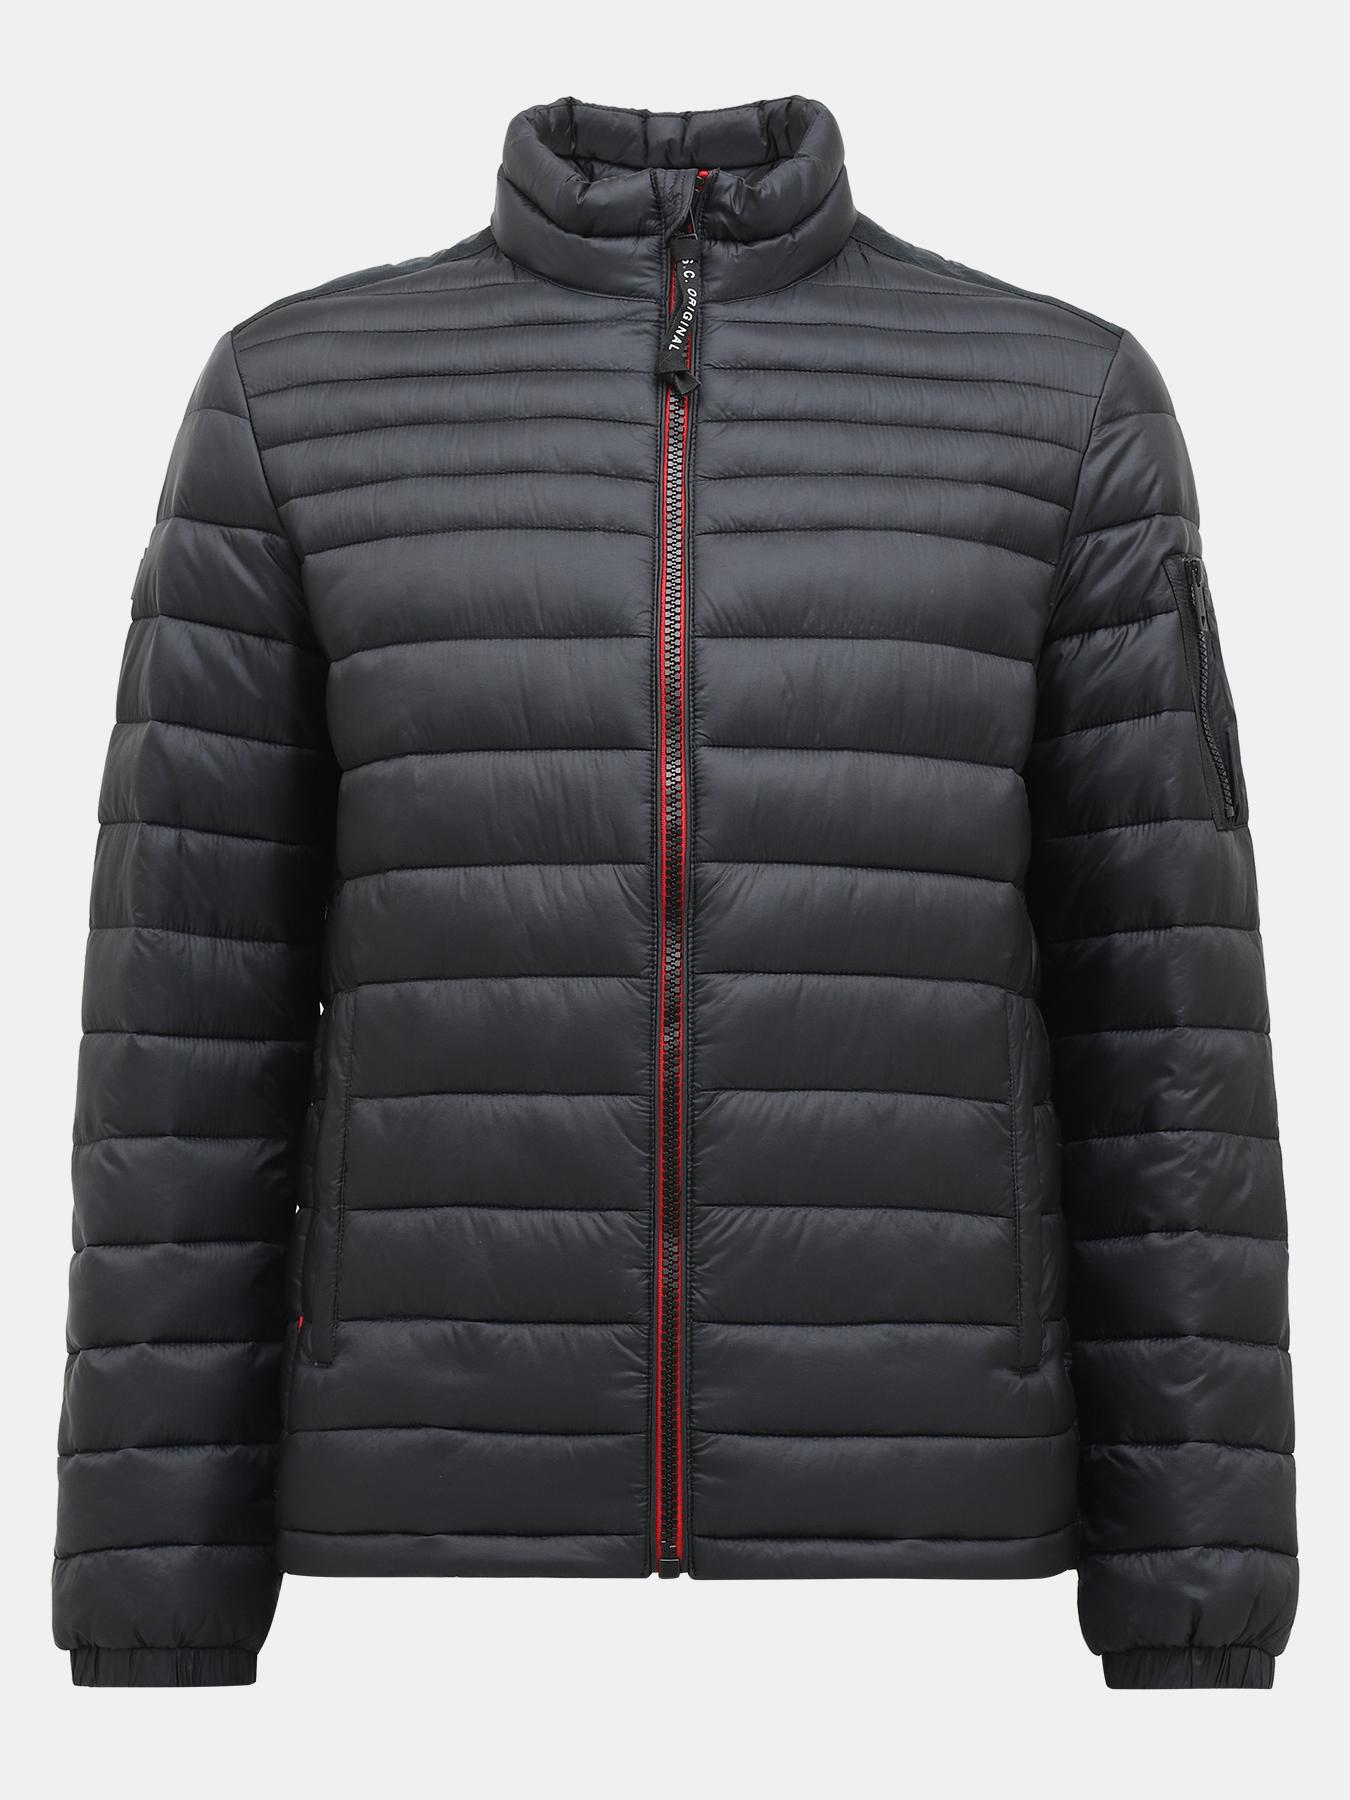 Куртки Strellson Куртка куртка утепленная strellson strellson st004emfvky5